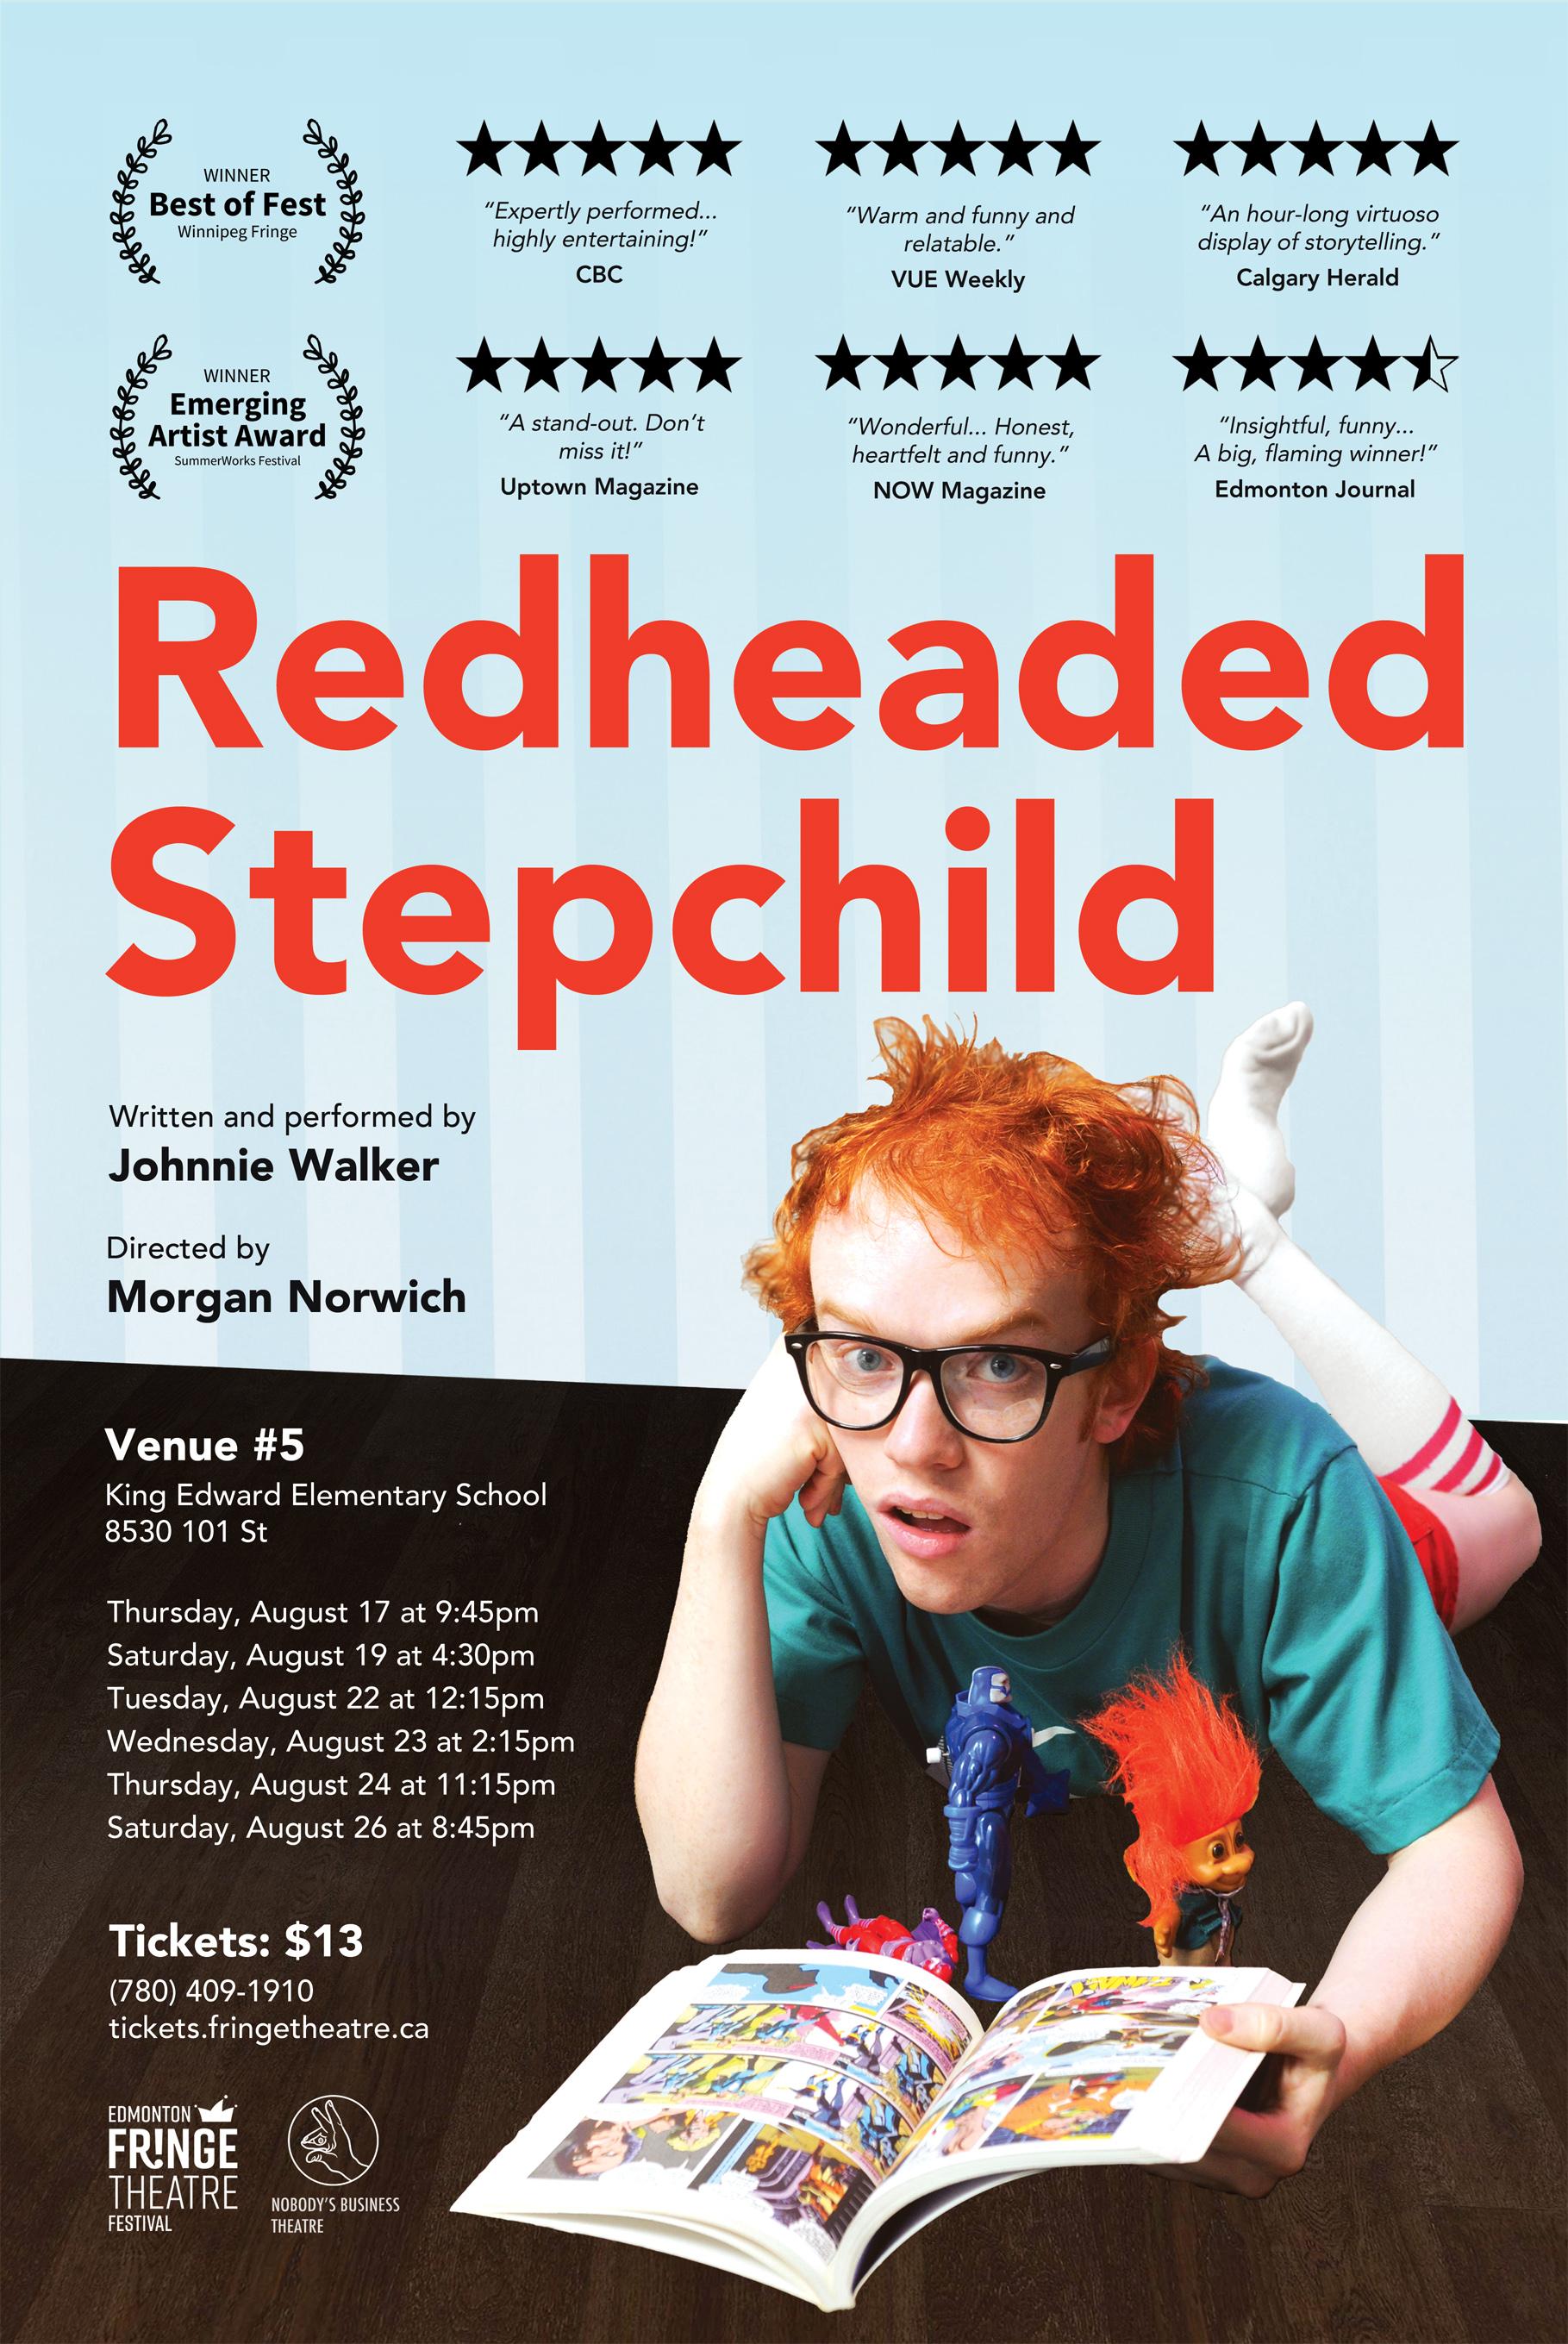 Redheaded Stepchild poster, 2017